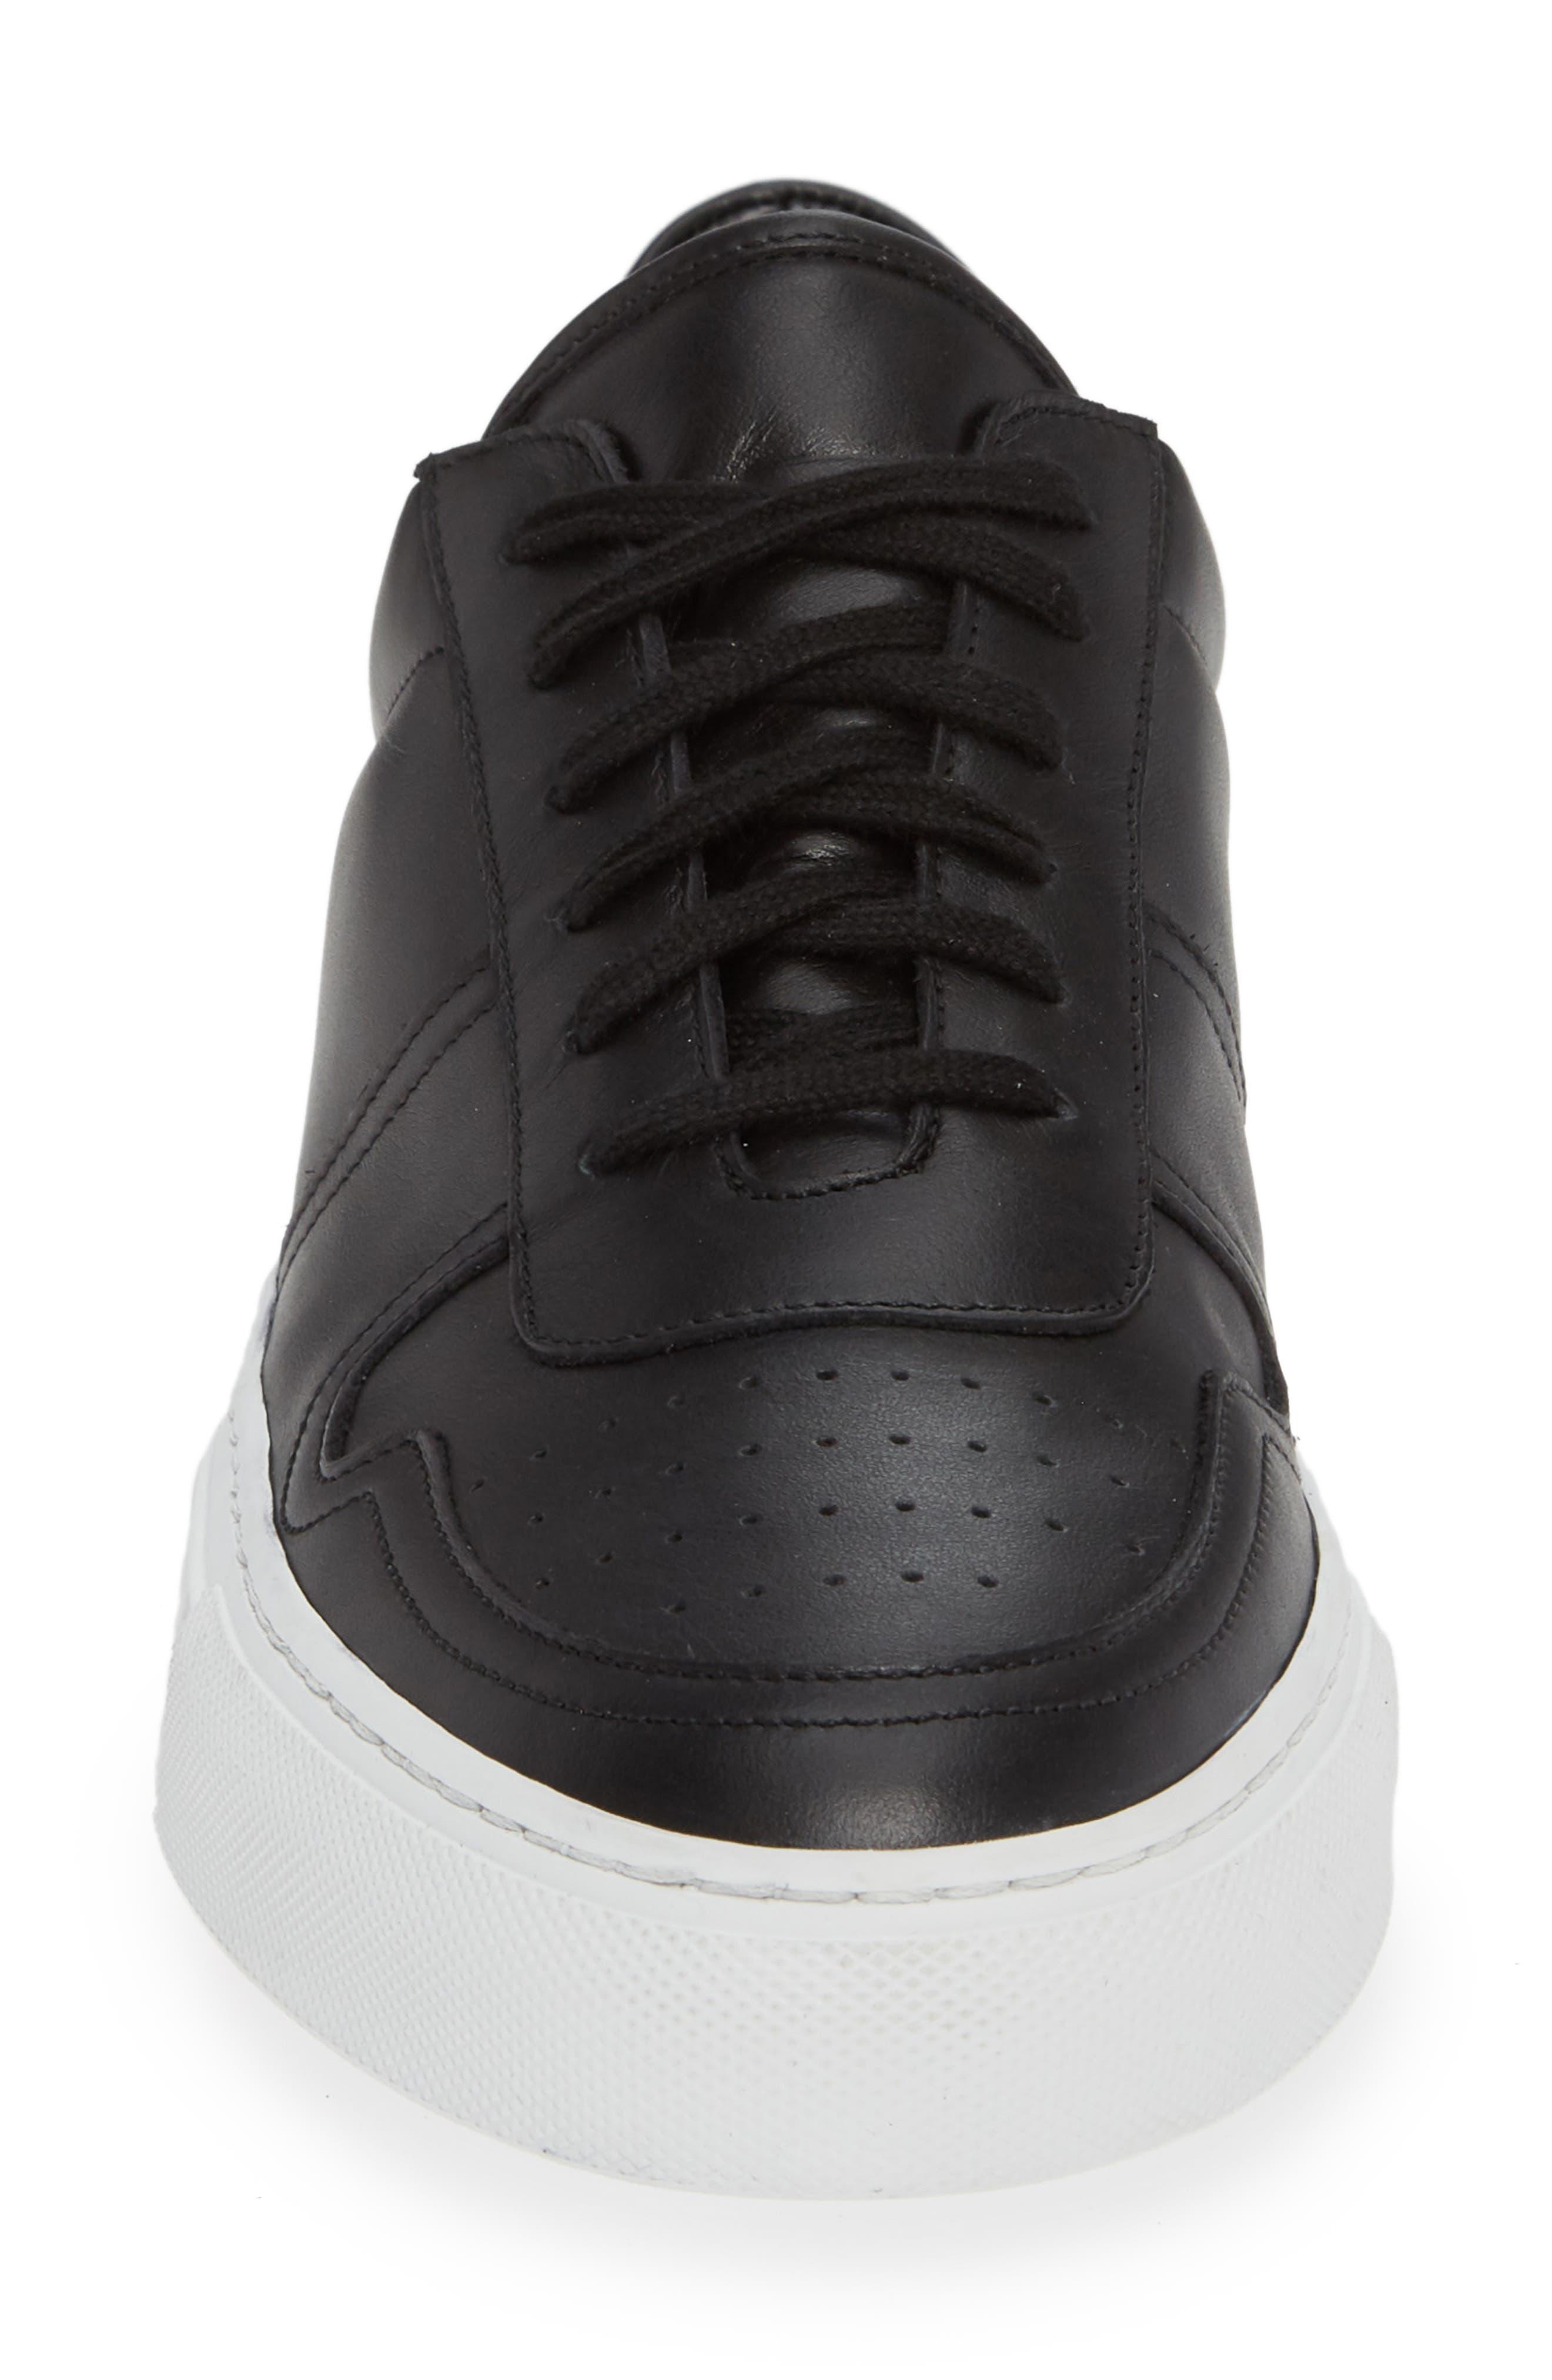 Bball Low Top Sneaker,                             Alternate thumbnail 4, color,                             BLACK